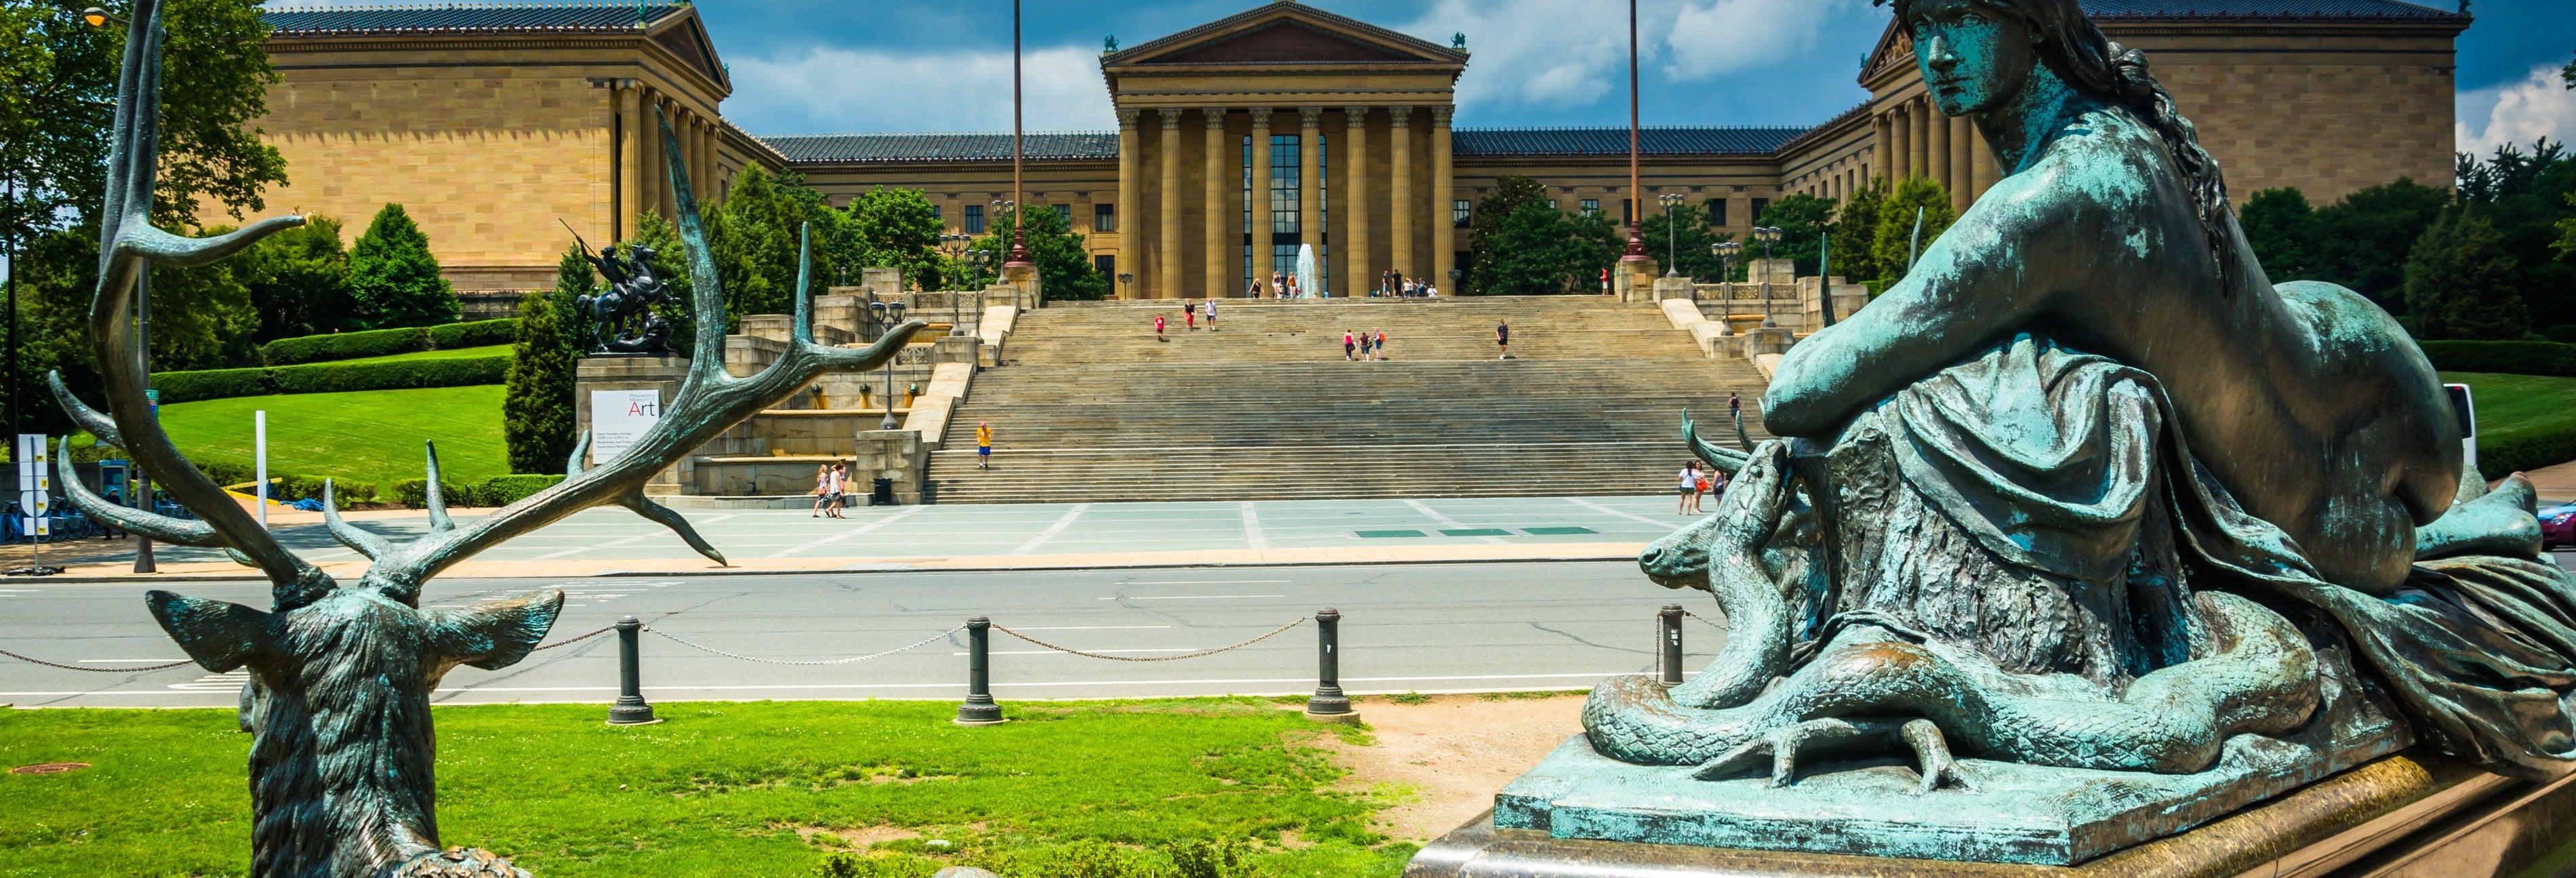 Visite alternative dans Philadelphie